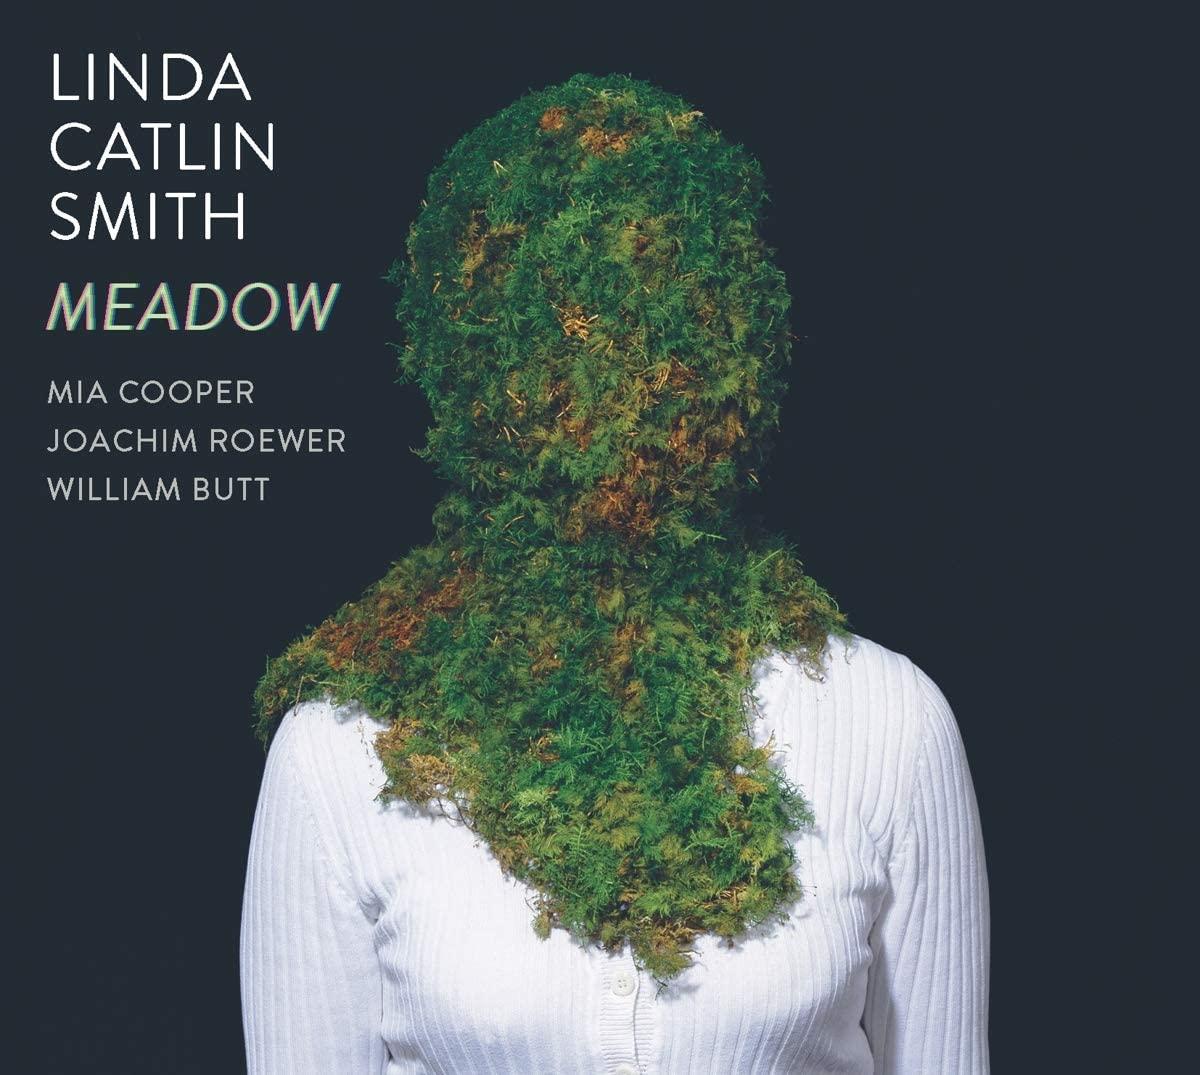 linda catlin smith